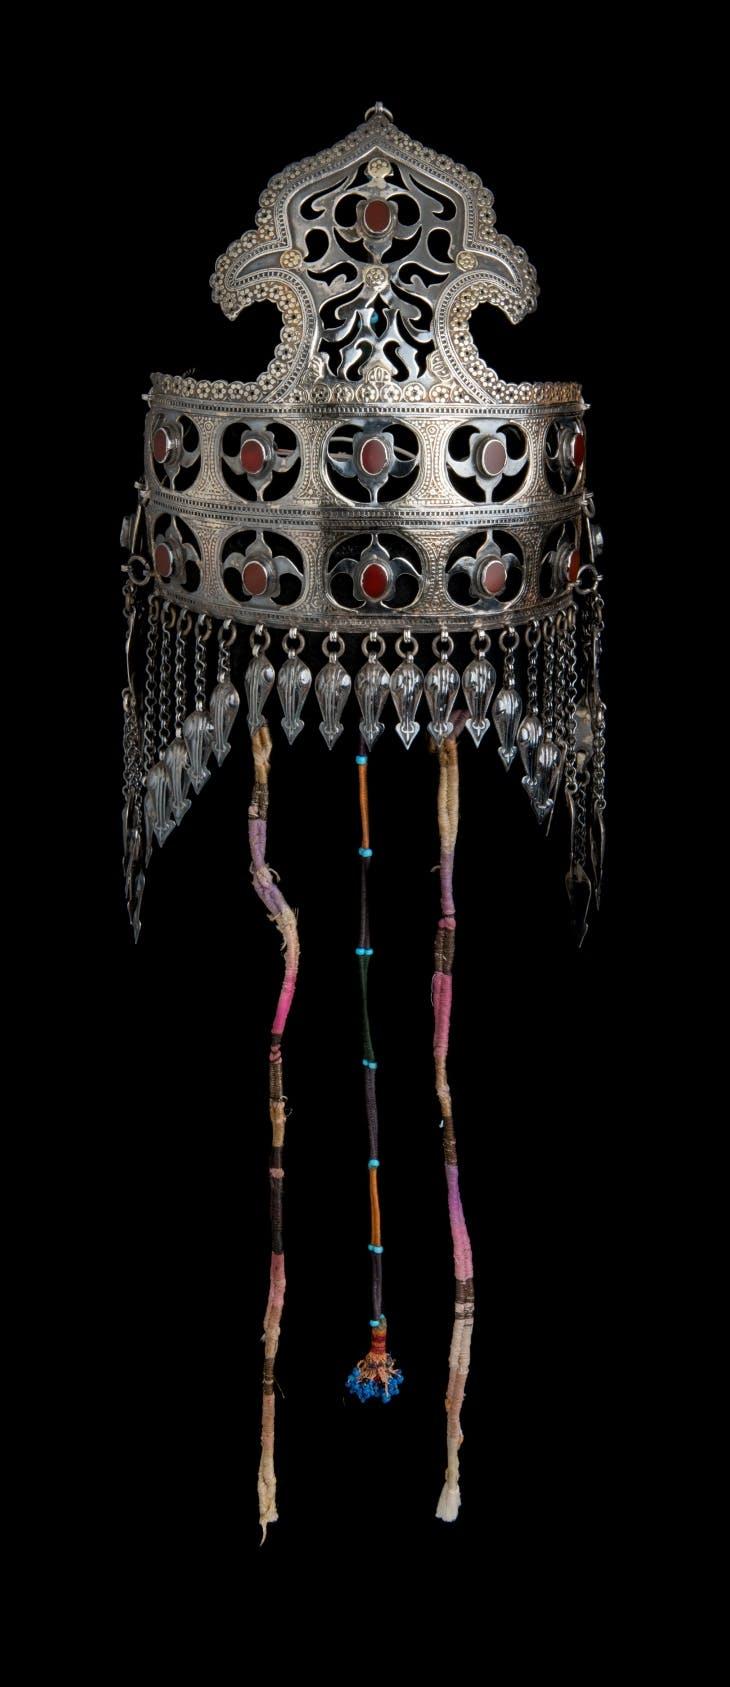 Headdress or Bridal Diadem (late 19th to early 20th century), Turkmenistan (Yomud, Teke, Nochuoli).